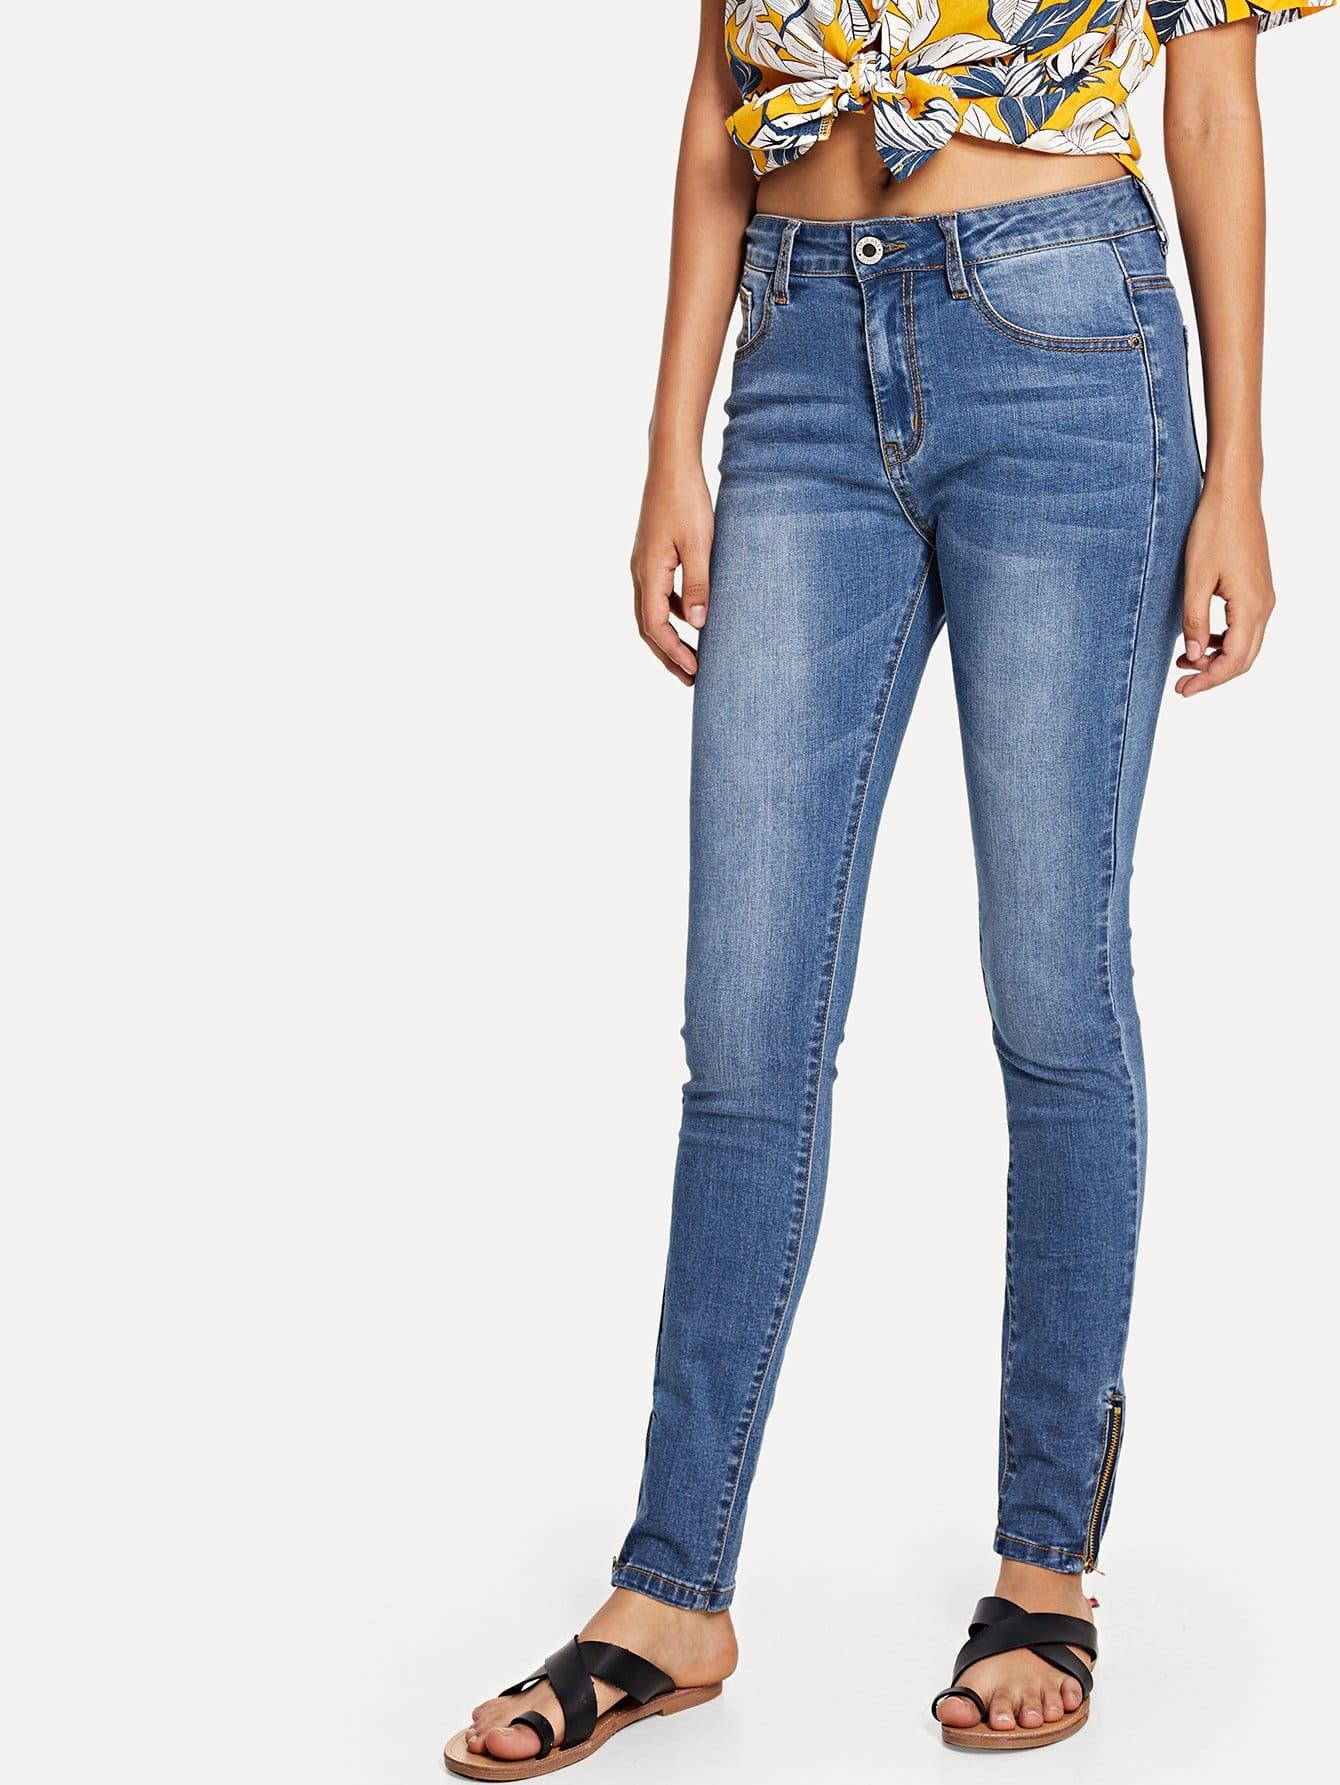 Zip Up Side Skinny Jeans